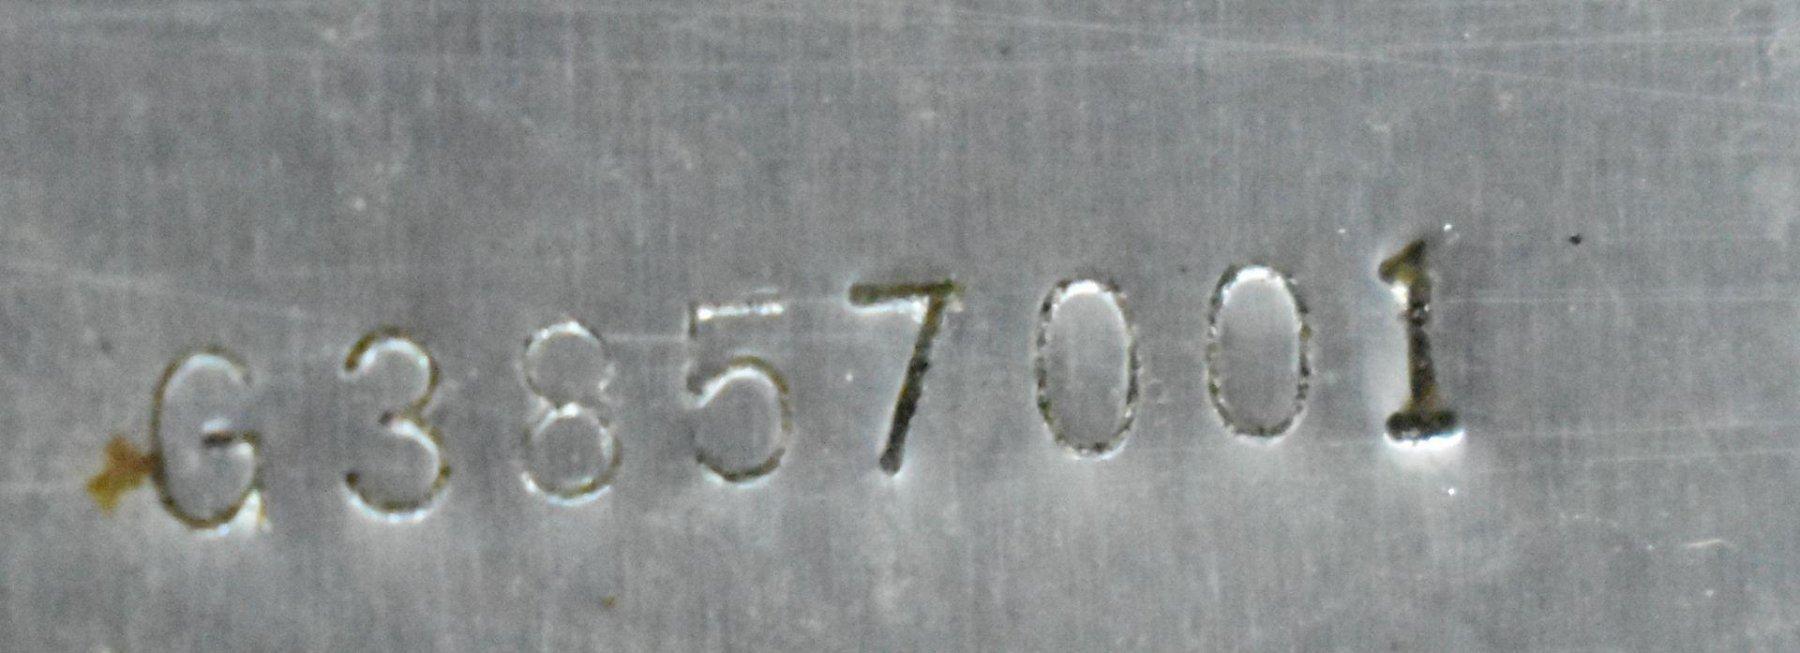 5d5fbd1cb768ac734508b626a52fa255-0c9a1e613bfdc382755a85b718658207.jpg